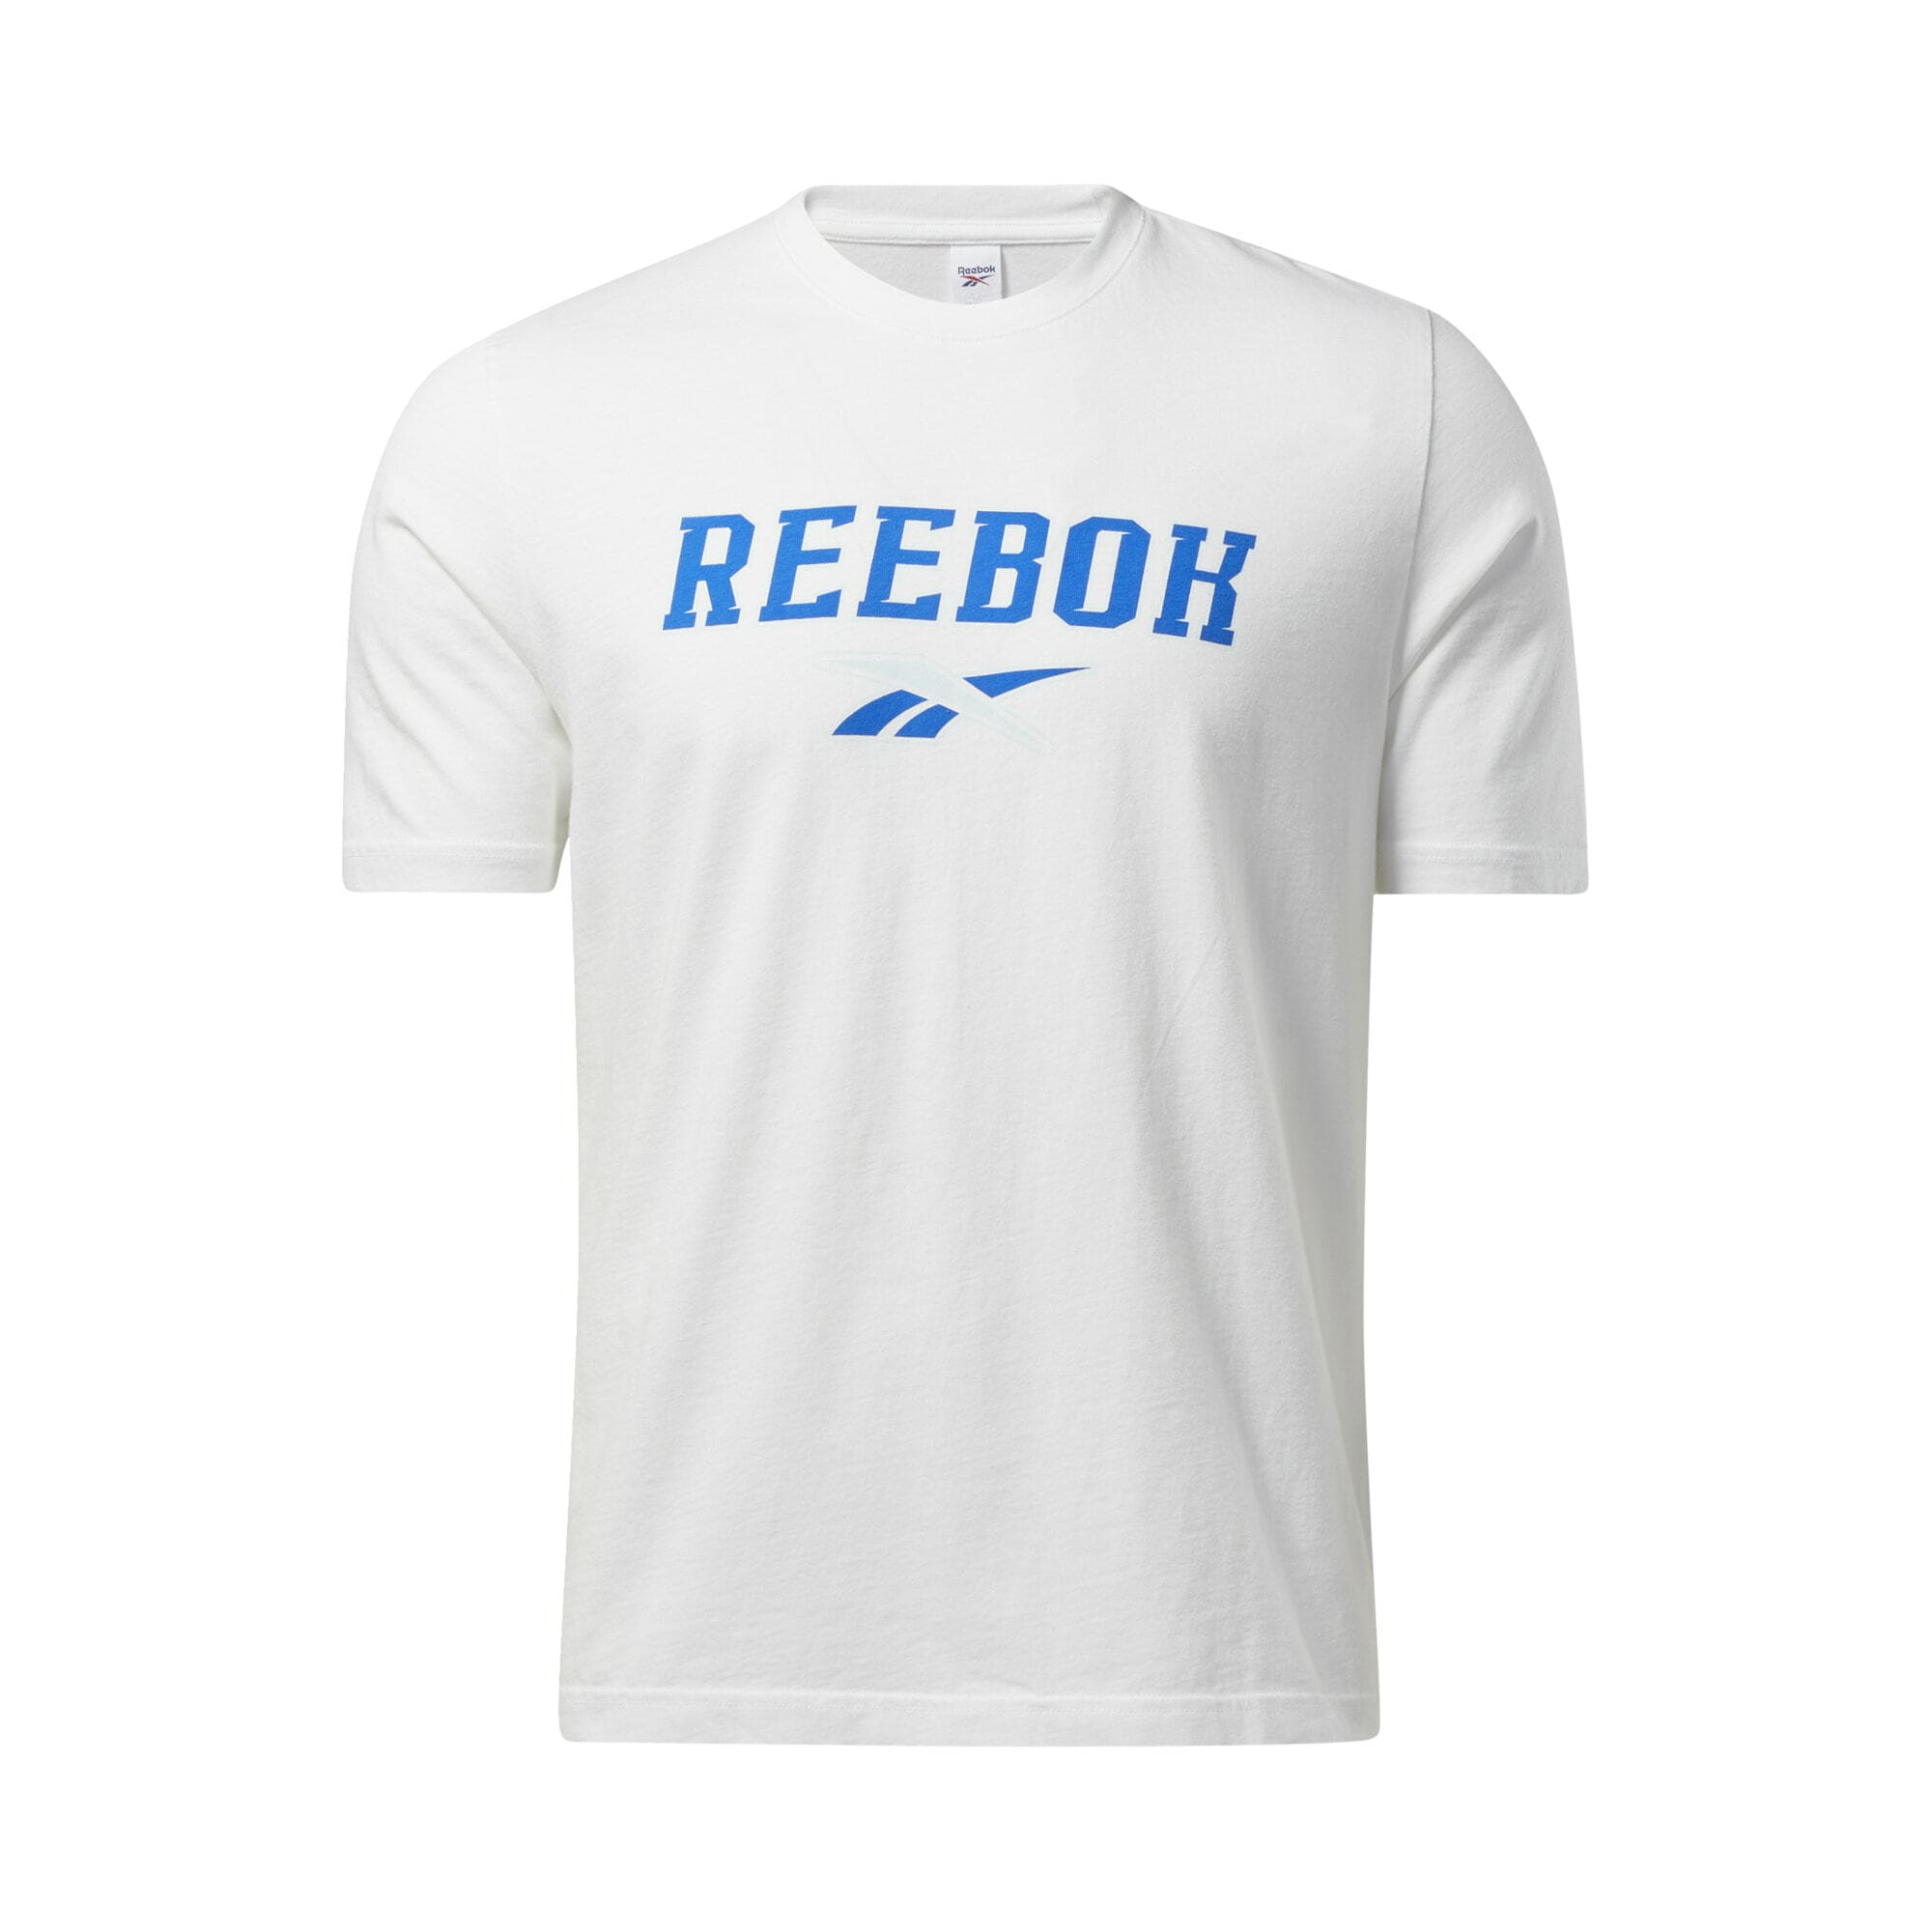 "Reebok Classics Marškinėliai balta / sodri mėlyna (""karališka"")"